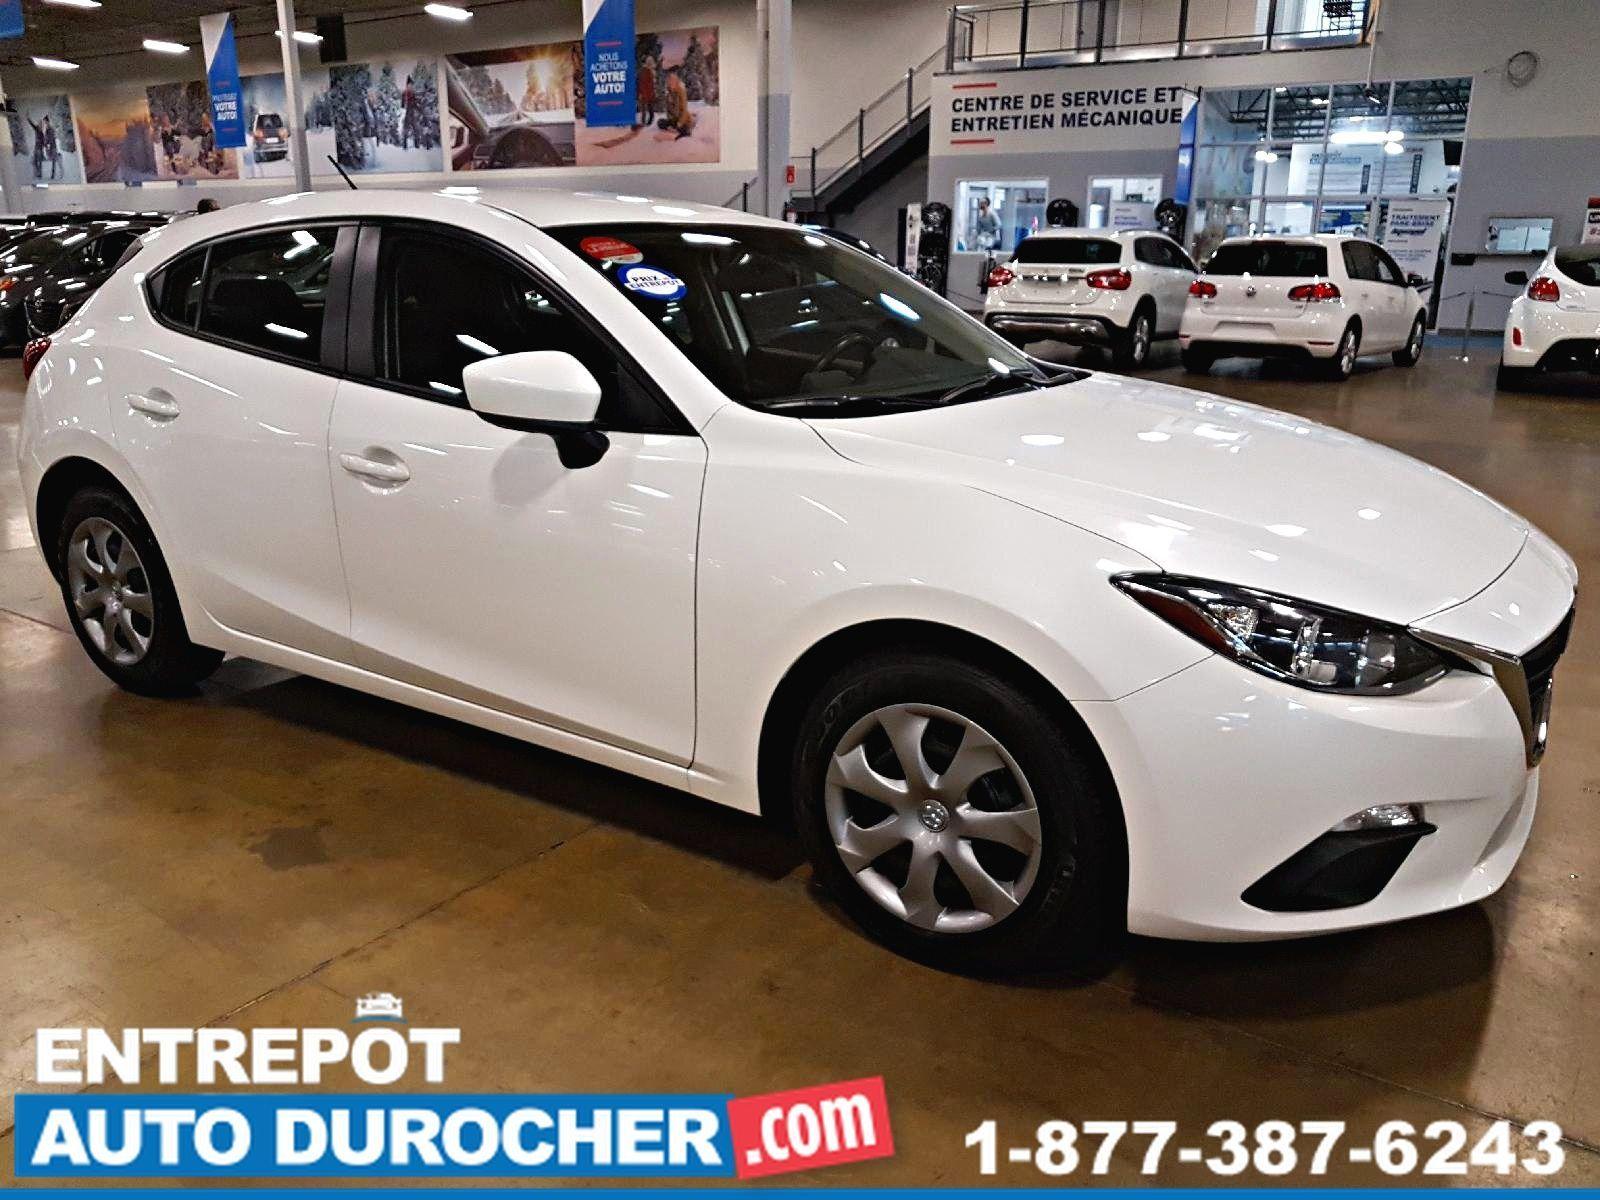 2015 Mazda Mazda3 GX - GROUPE ÉLECTRIQUE